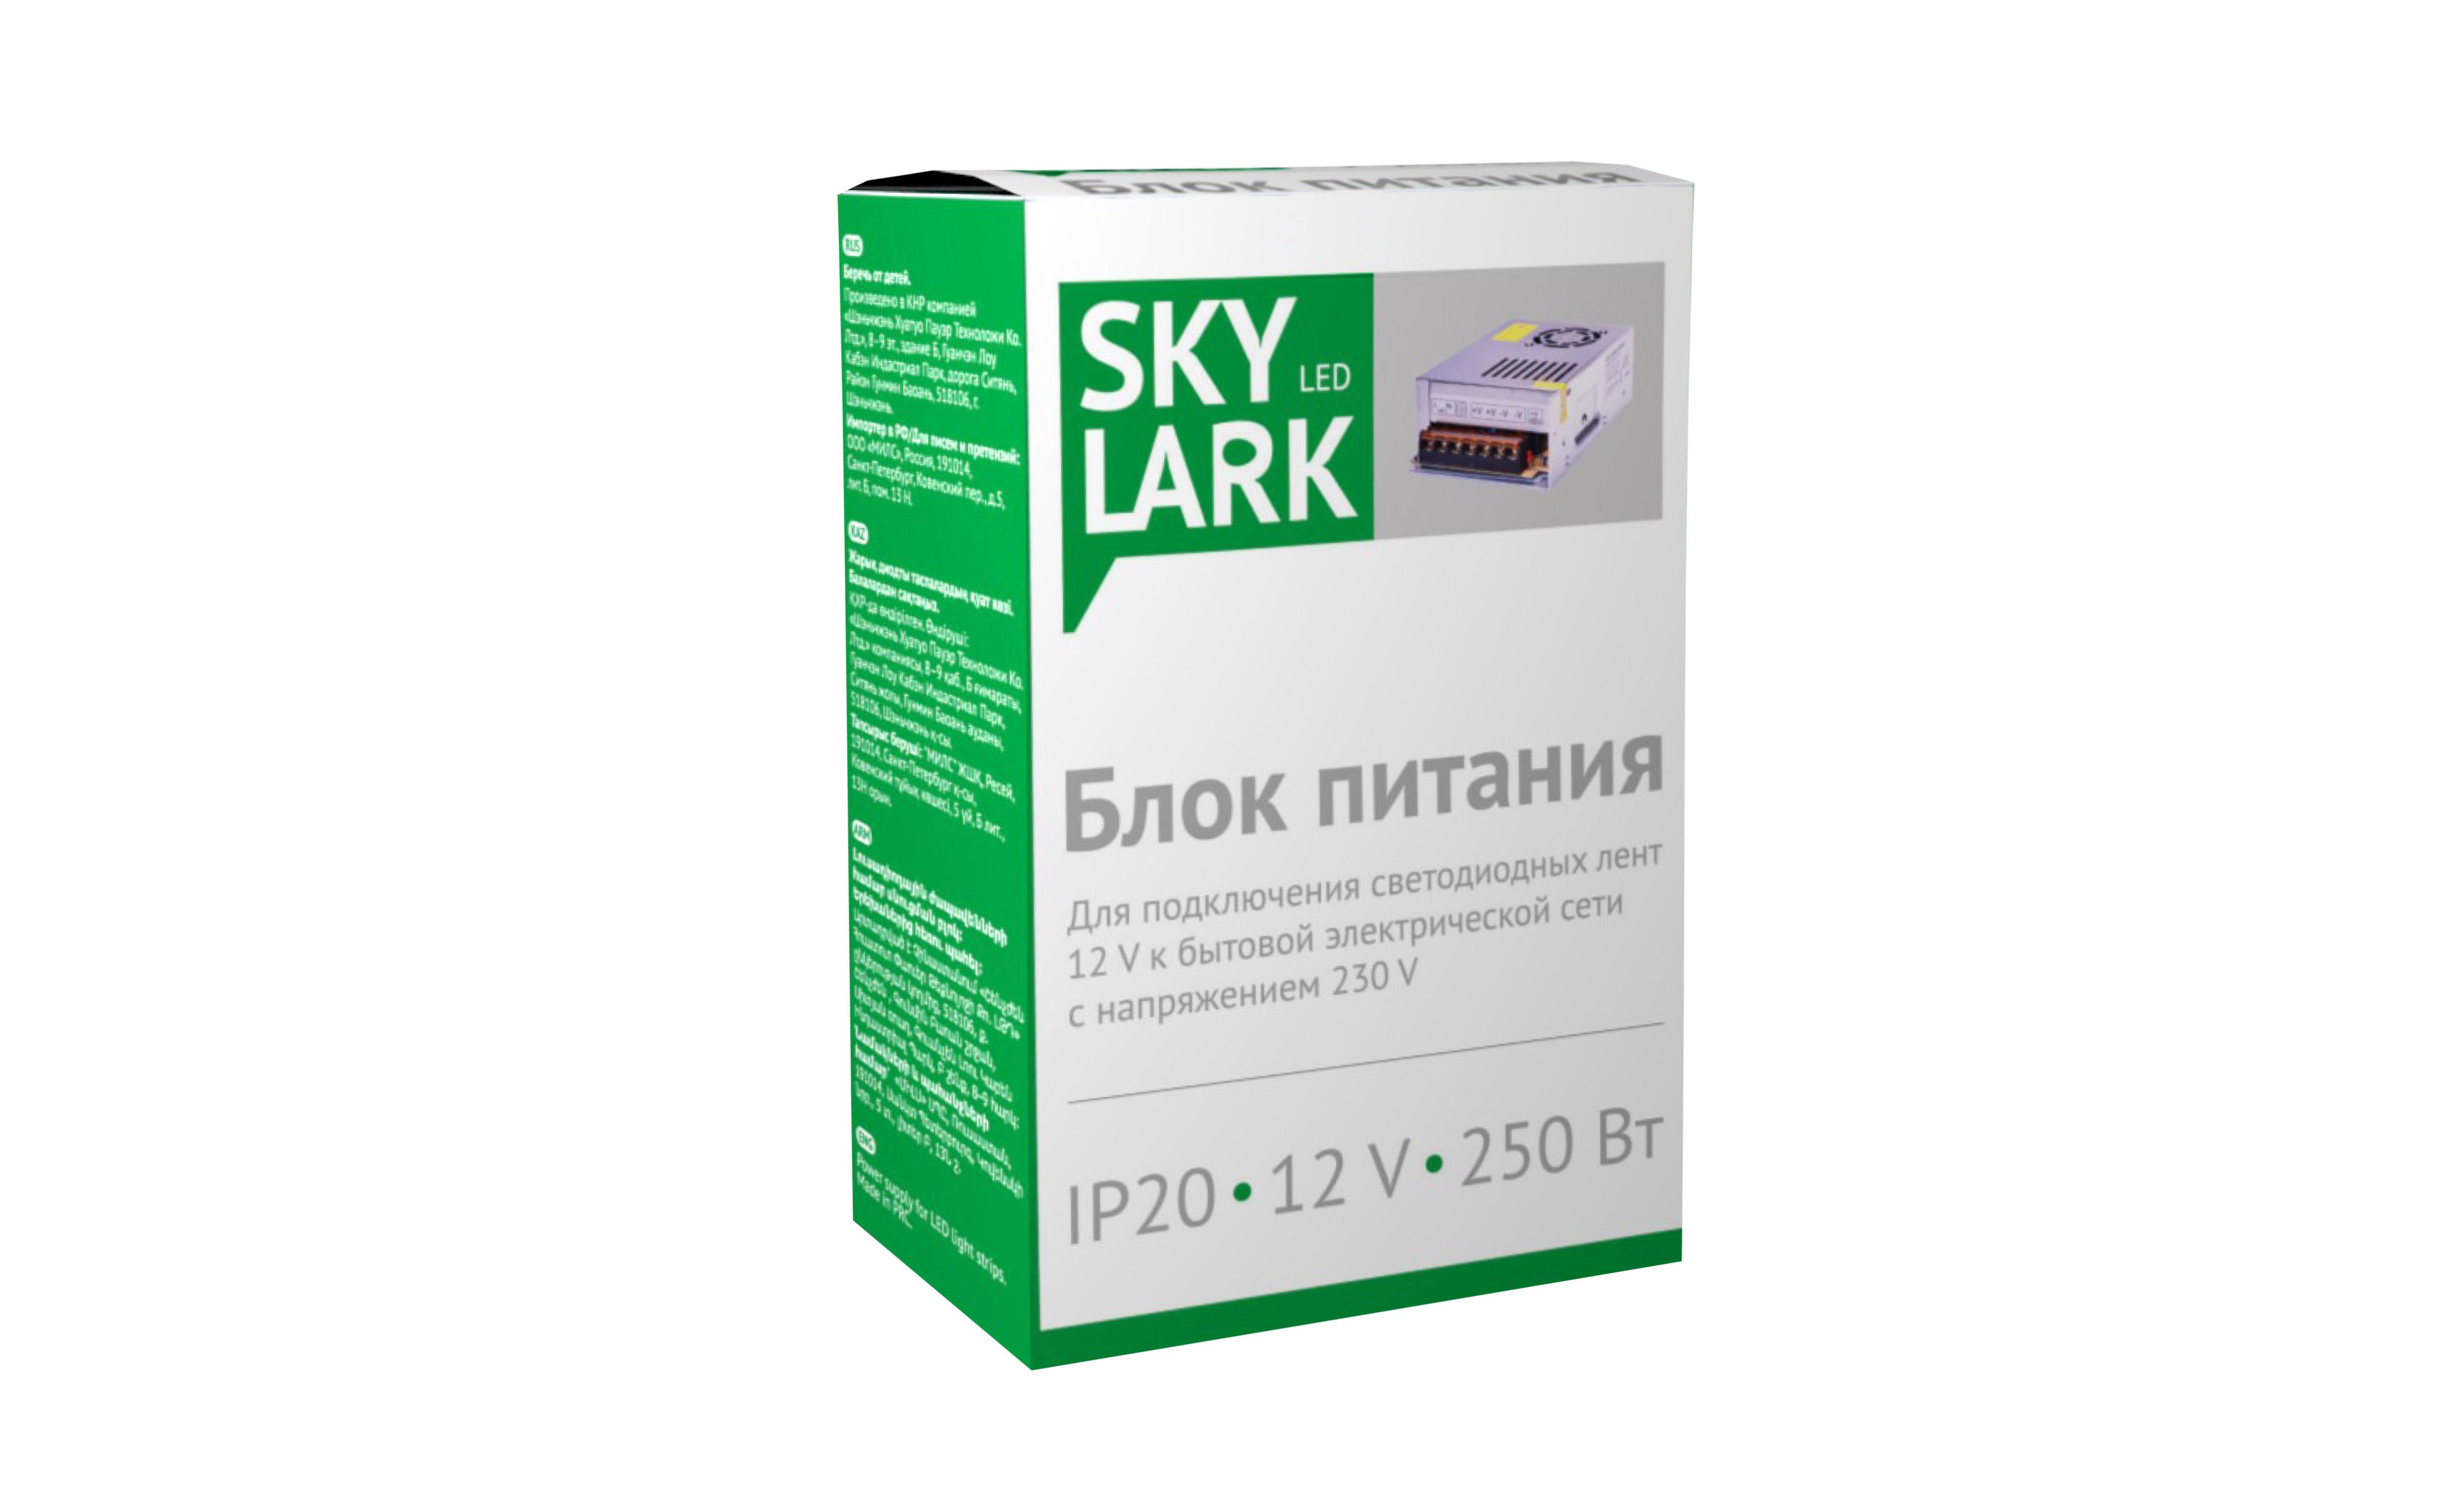 Блок питания Skylark S029 блок питания abb 1svr427044r0200